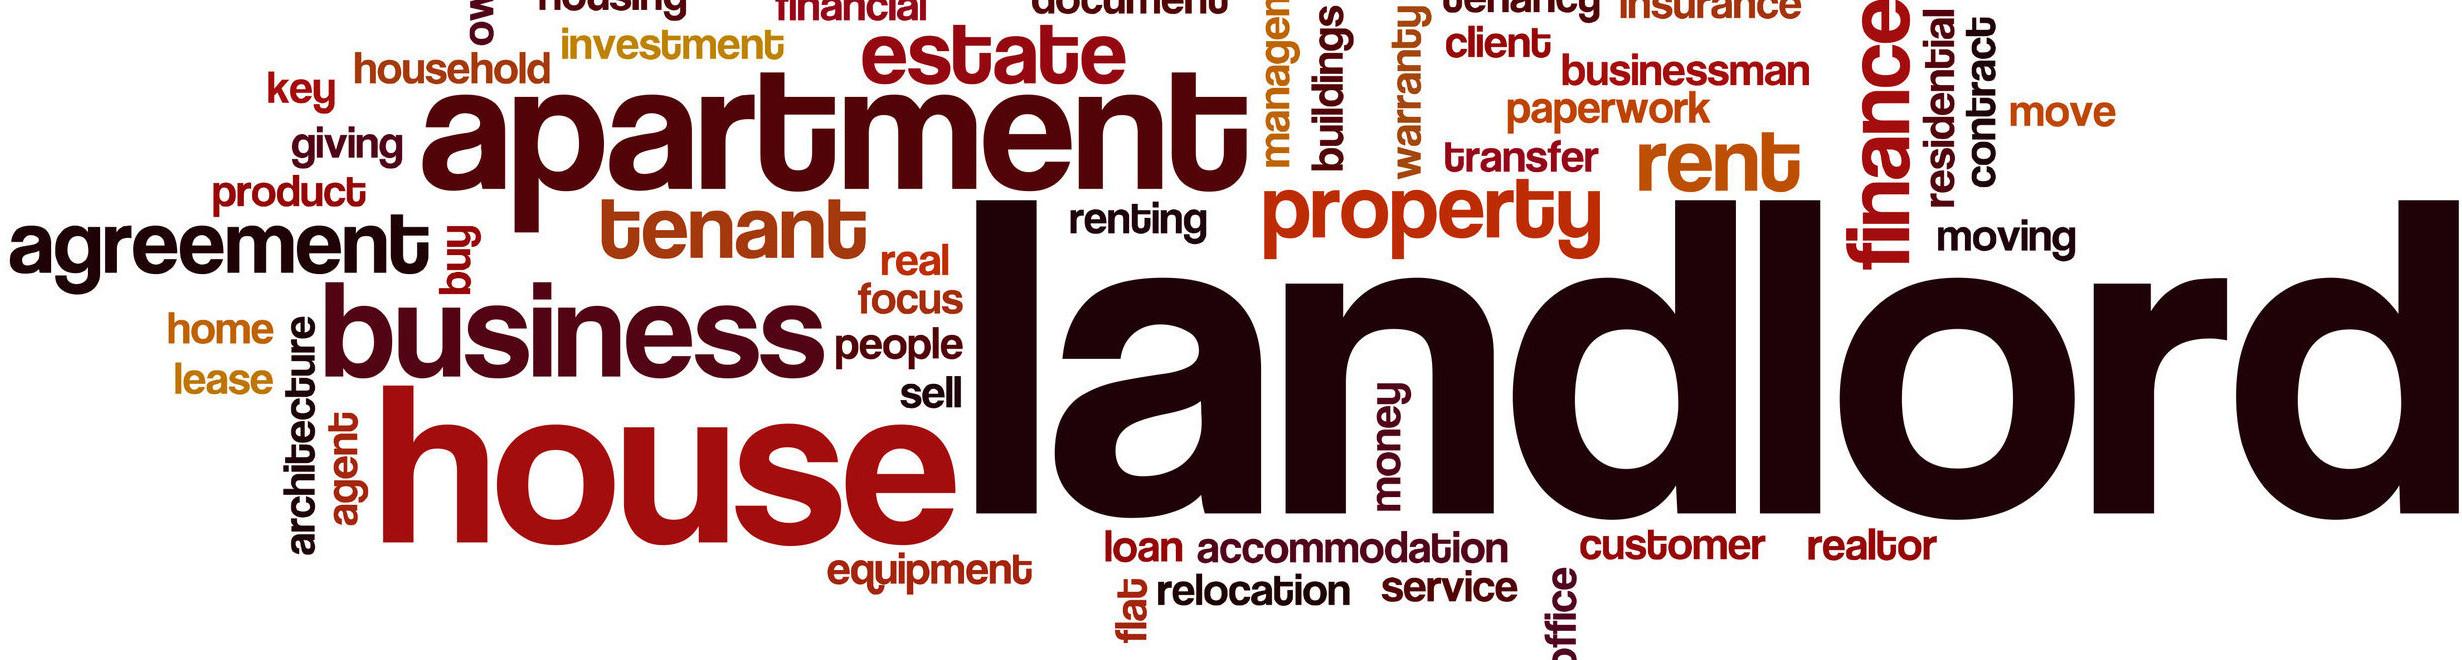 Tenancy Deposit Scheme - Scottish landlord loses appeal